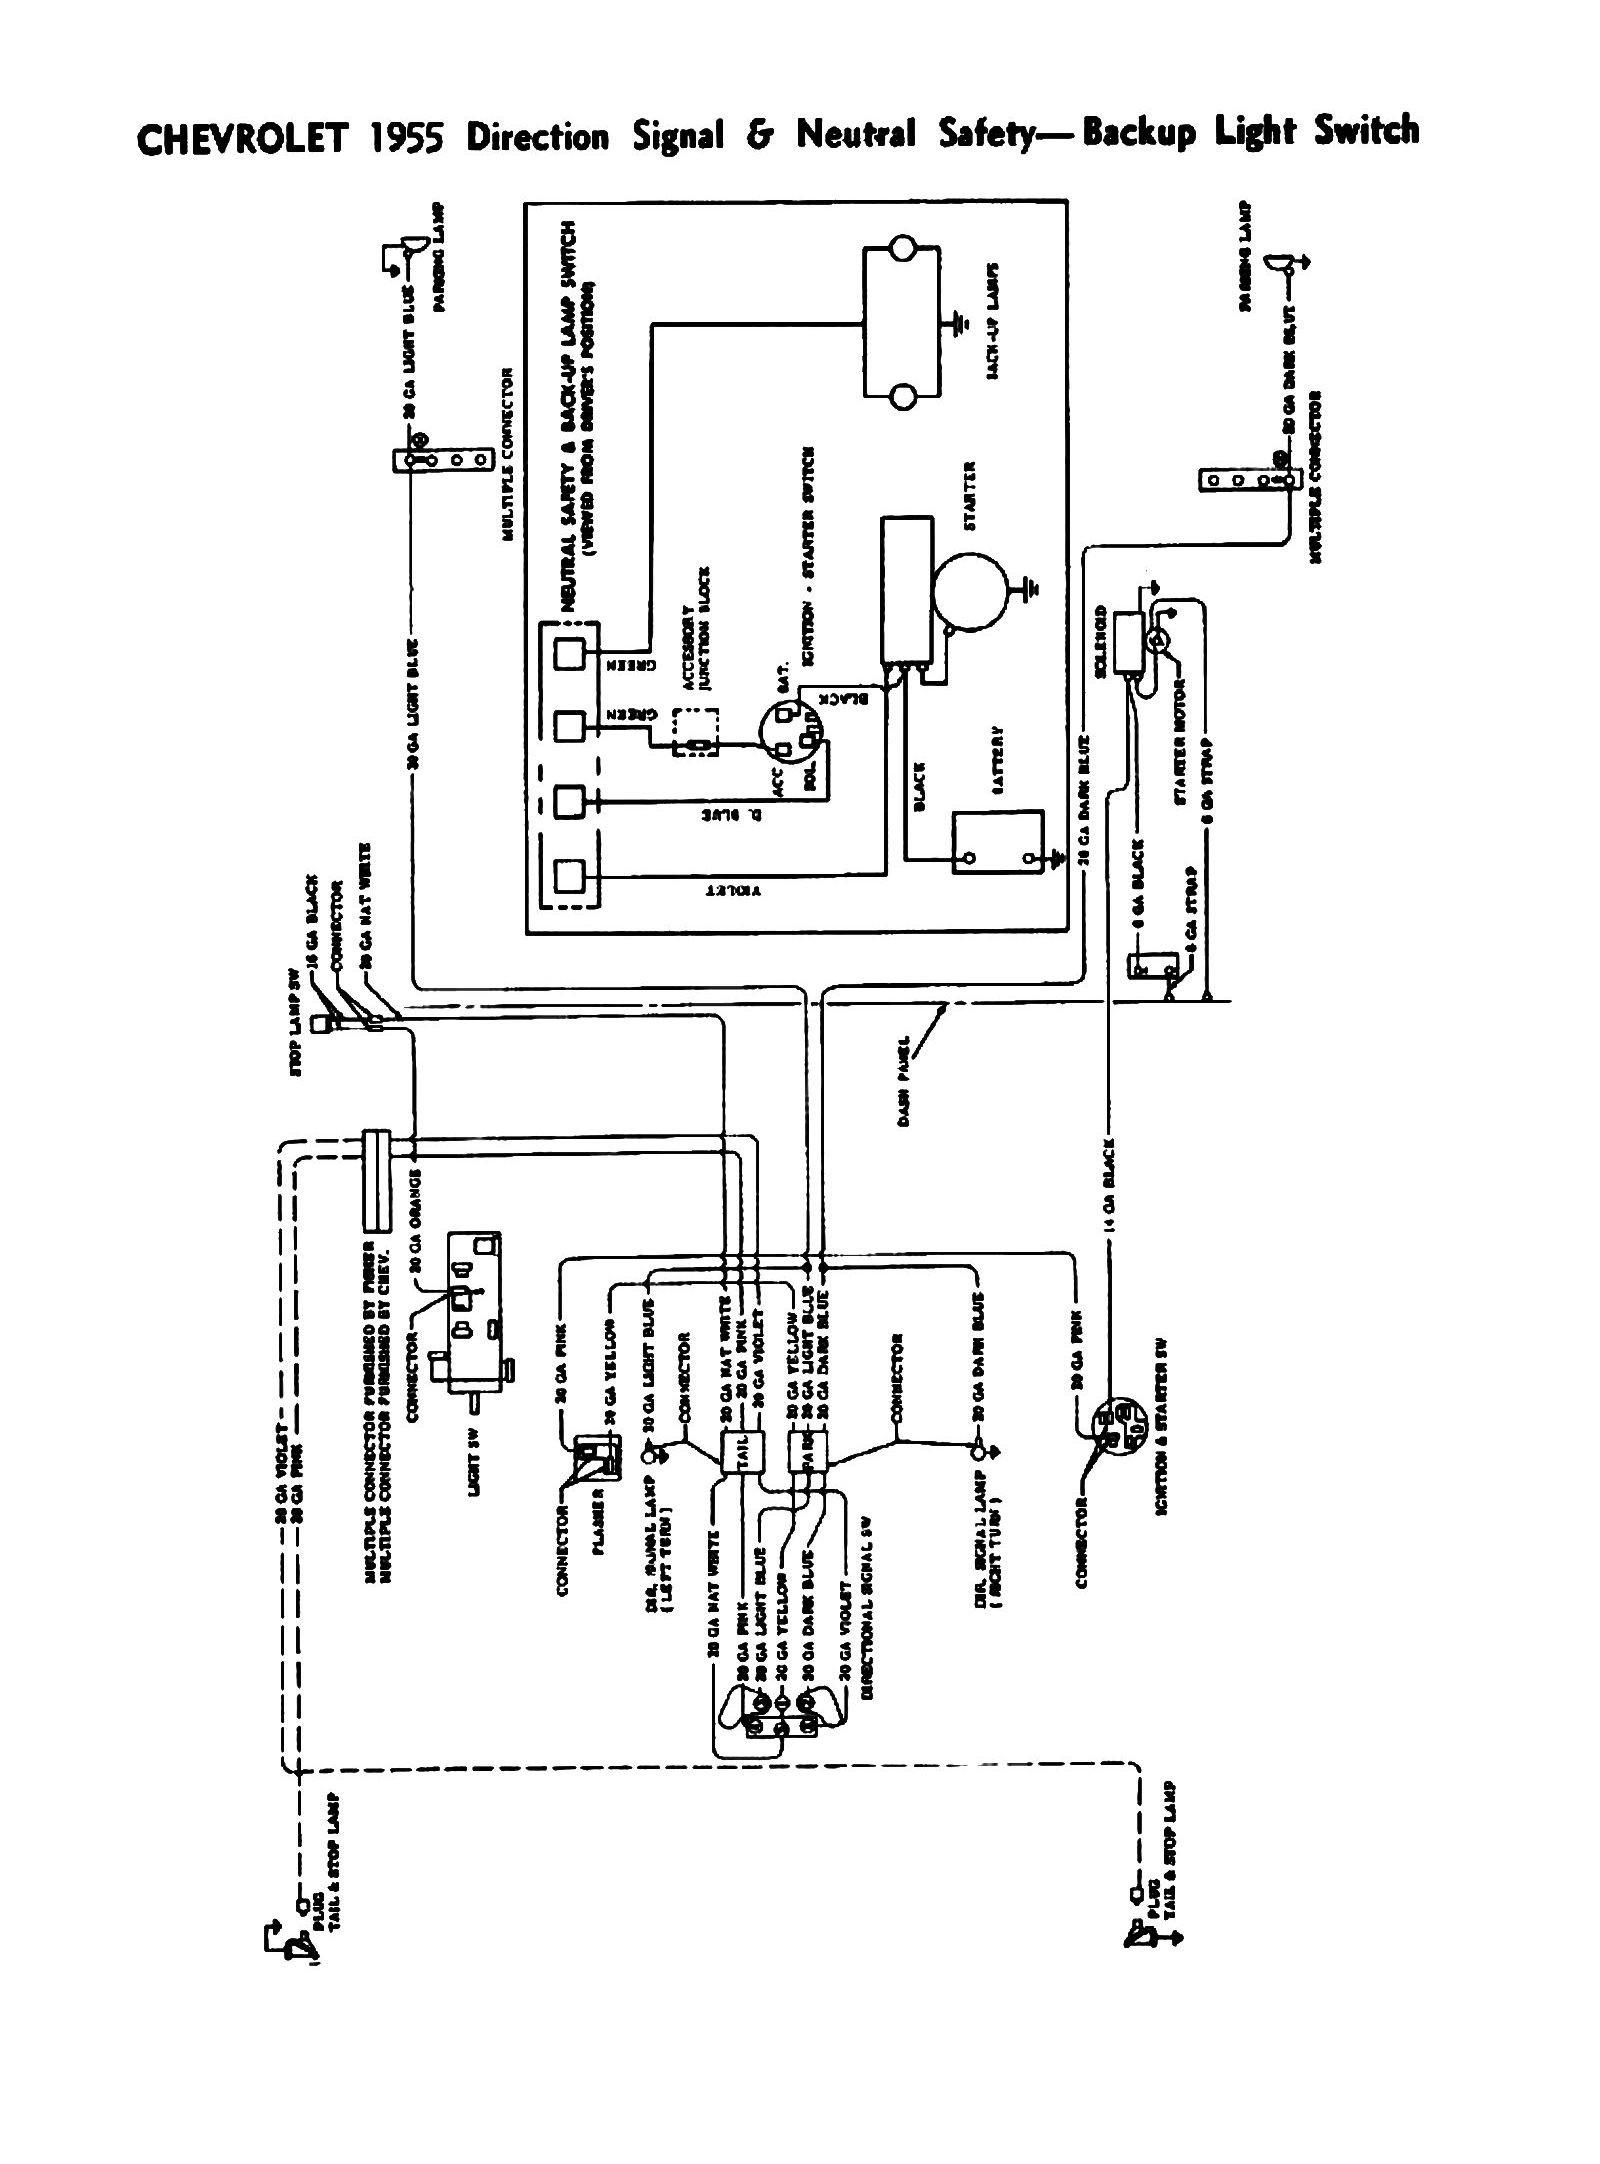 57 Chevy Turn Signal Wiring Diagram - Wiring Diagram Server sound-collect -  sound-collect.ristoranteitredenari.it | Cj5 Turn Signal Wiring Diagram |  | Ristorante I Tre Denari Manerbio